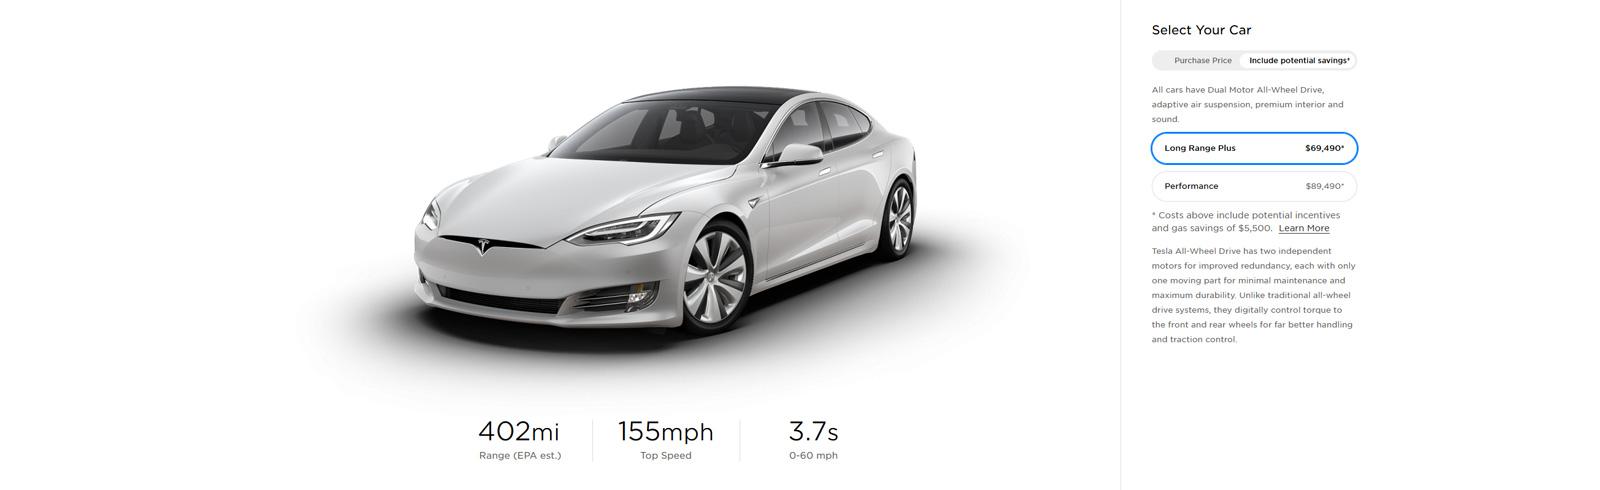 2020 Tesla Model S Long Range Plus gets an increase in range to 402 miles (EPA)